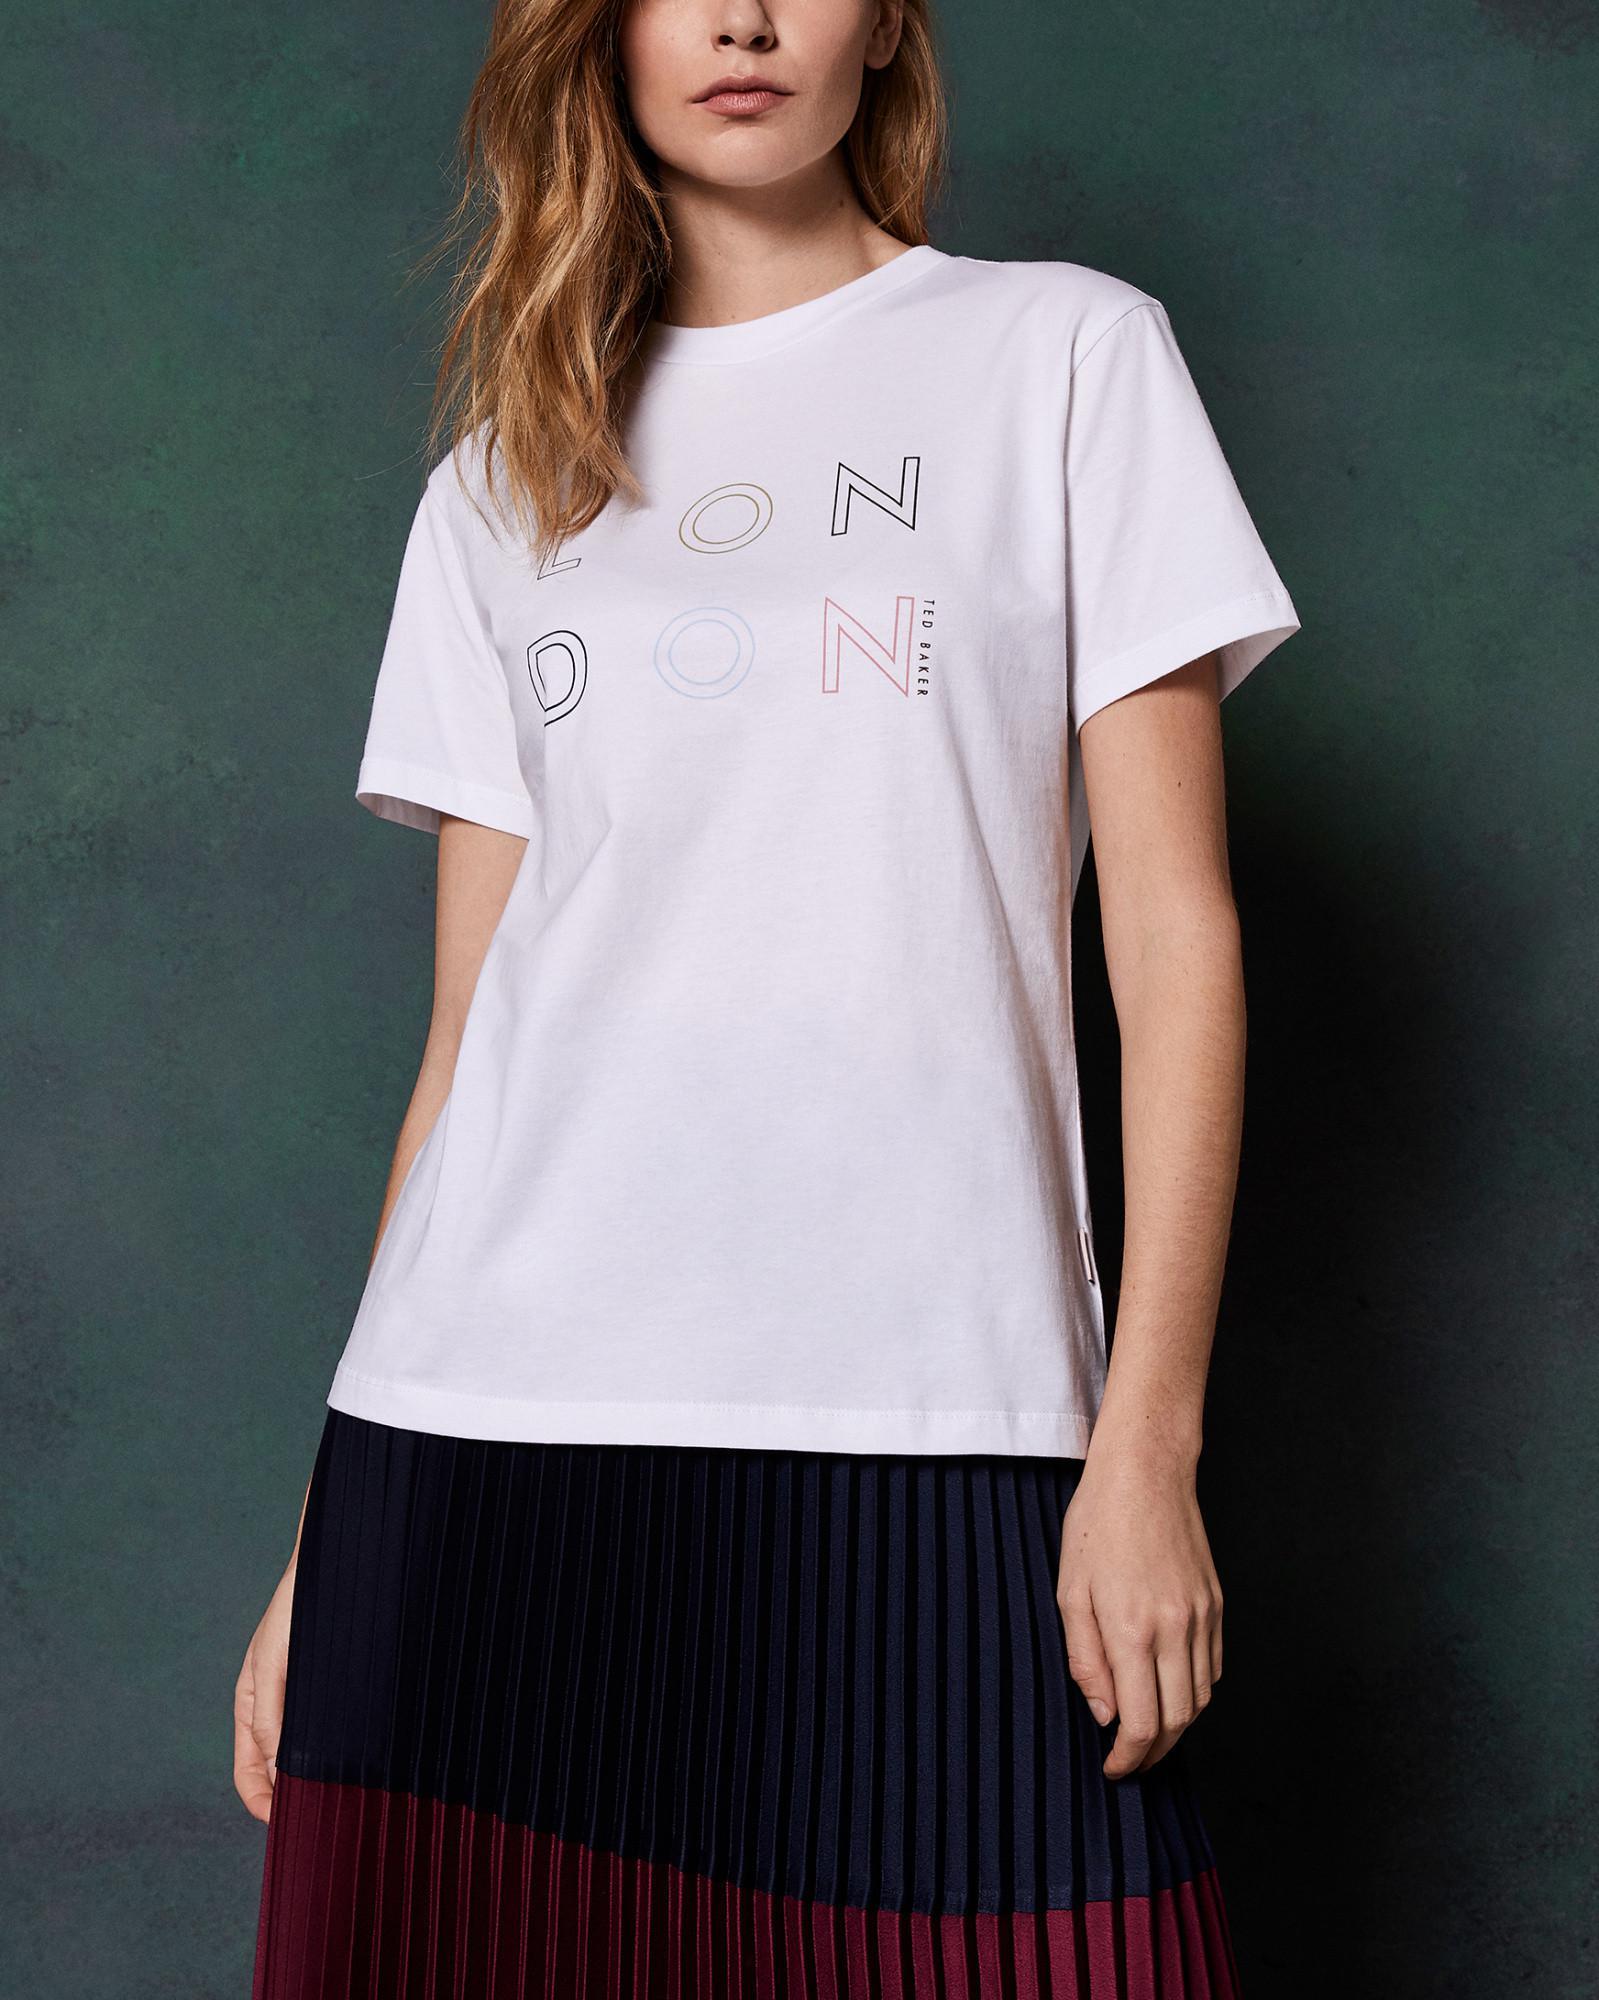 d06ad639d Lyst - Ted Baker Logo London T-shirt in White